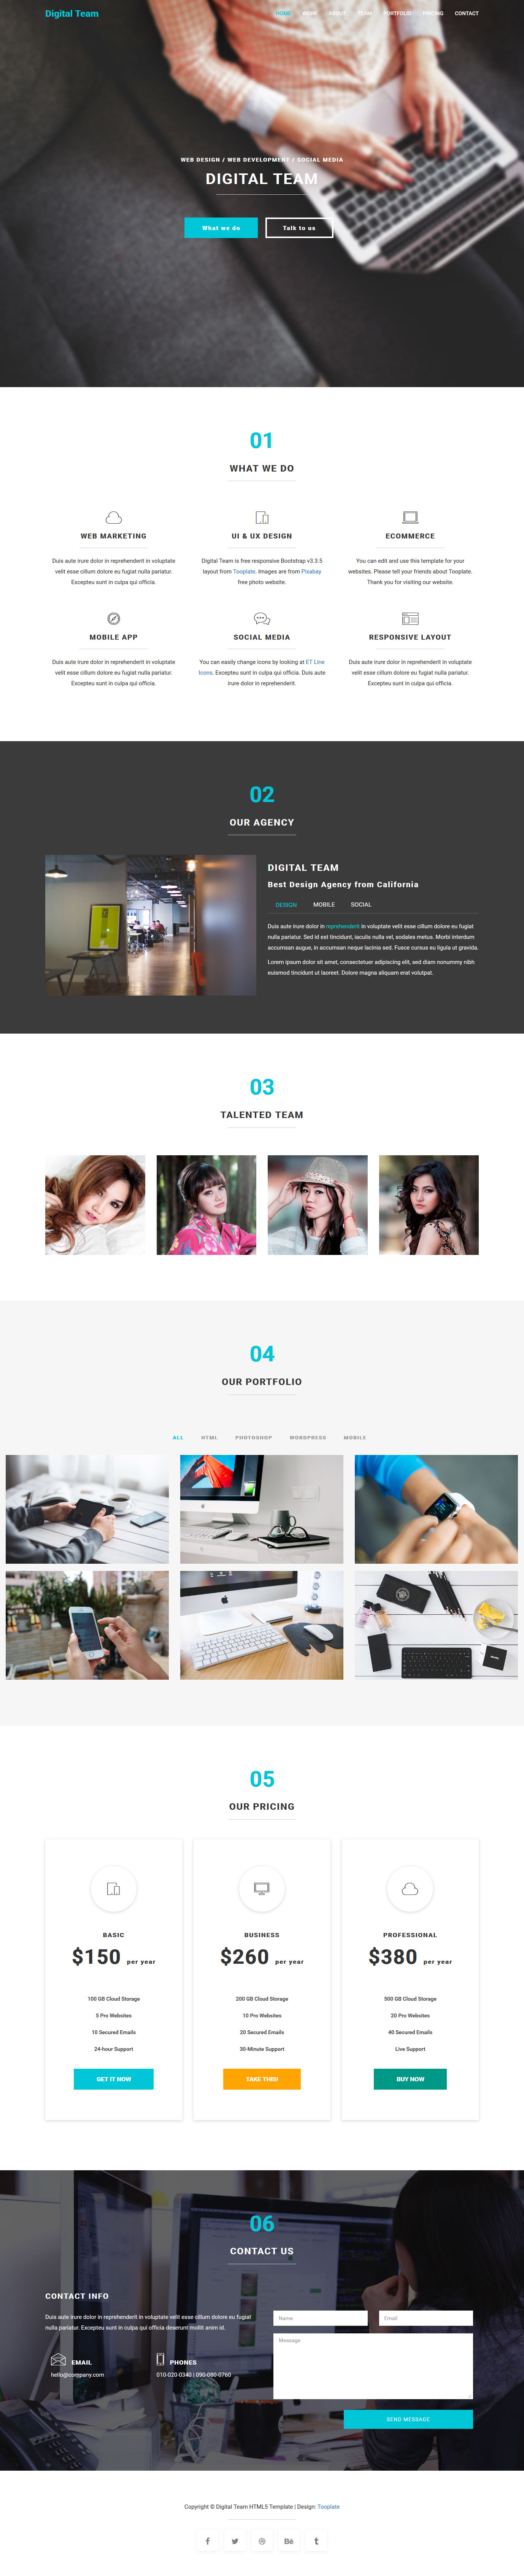 Digital Team HTML5 - Free Templates